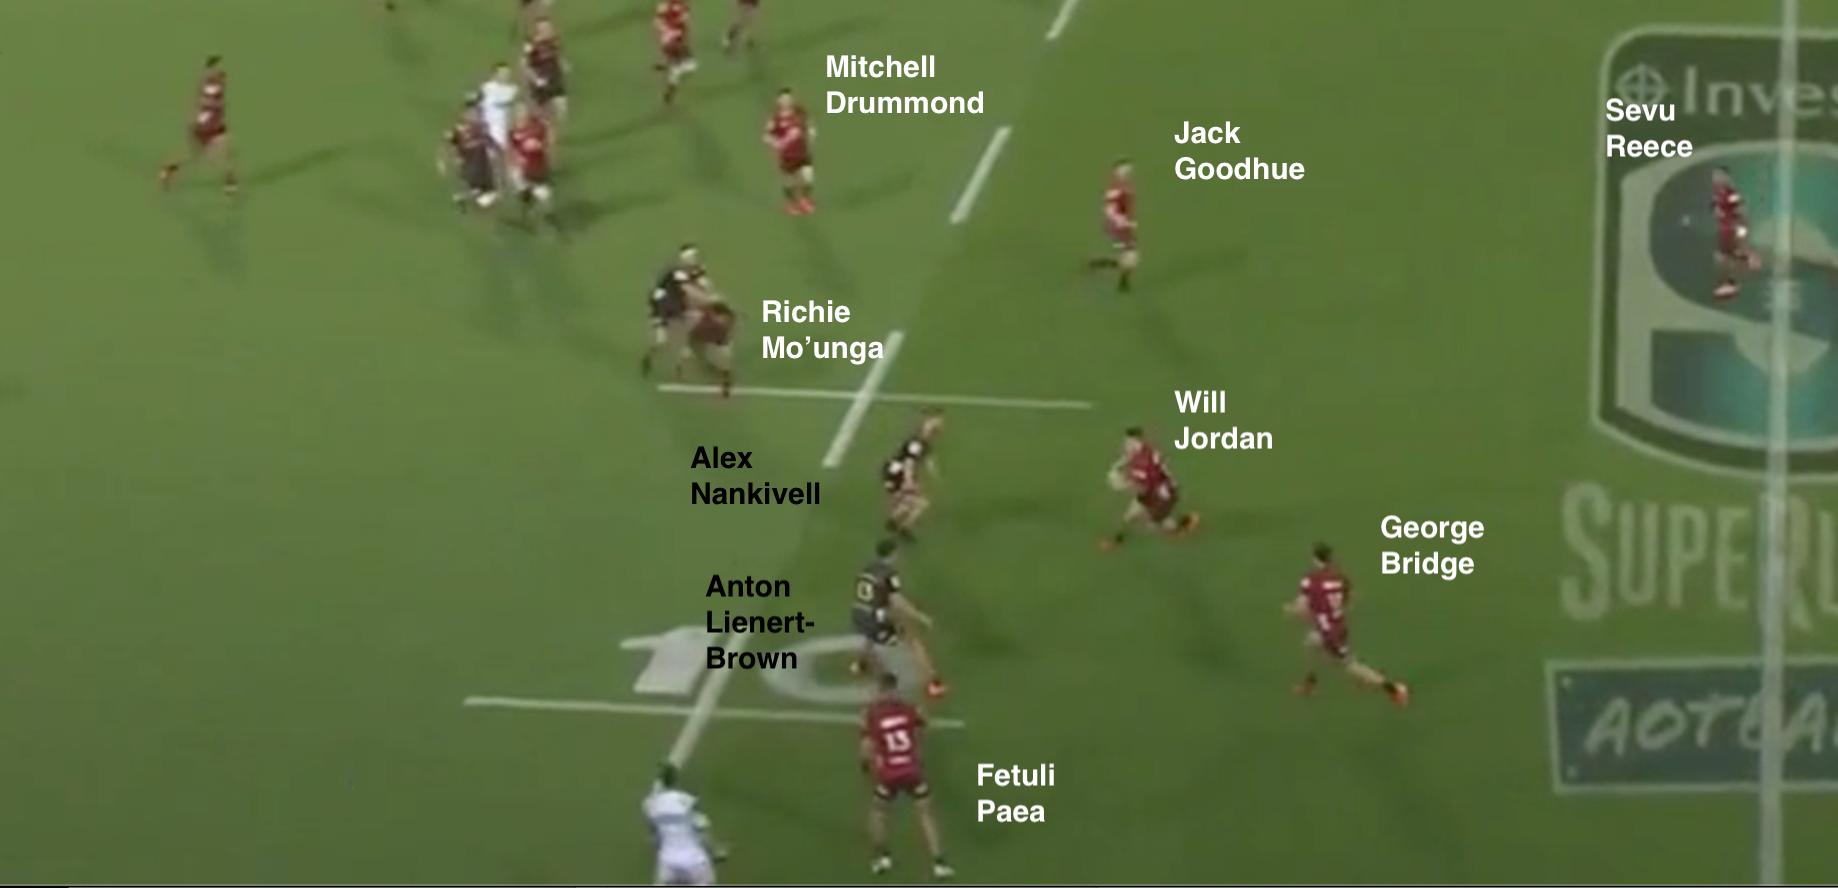 Crusaders backline support play vs chiefs. Will Jordan, George Bridge, Sevu Reece, Richie Mo'unga, Mitchell Drummond, Jack Goodhue